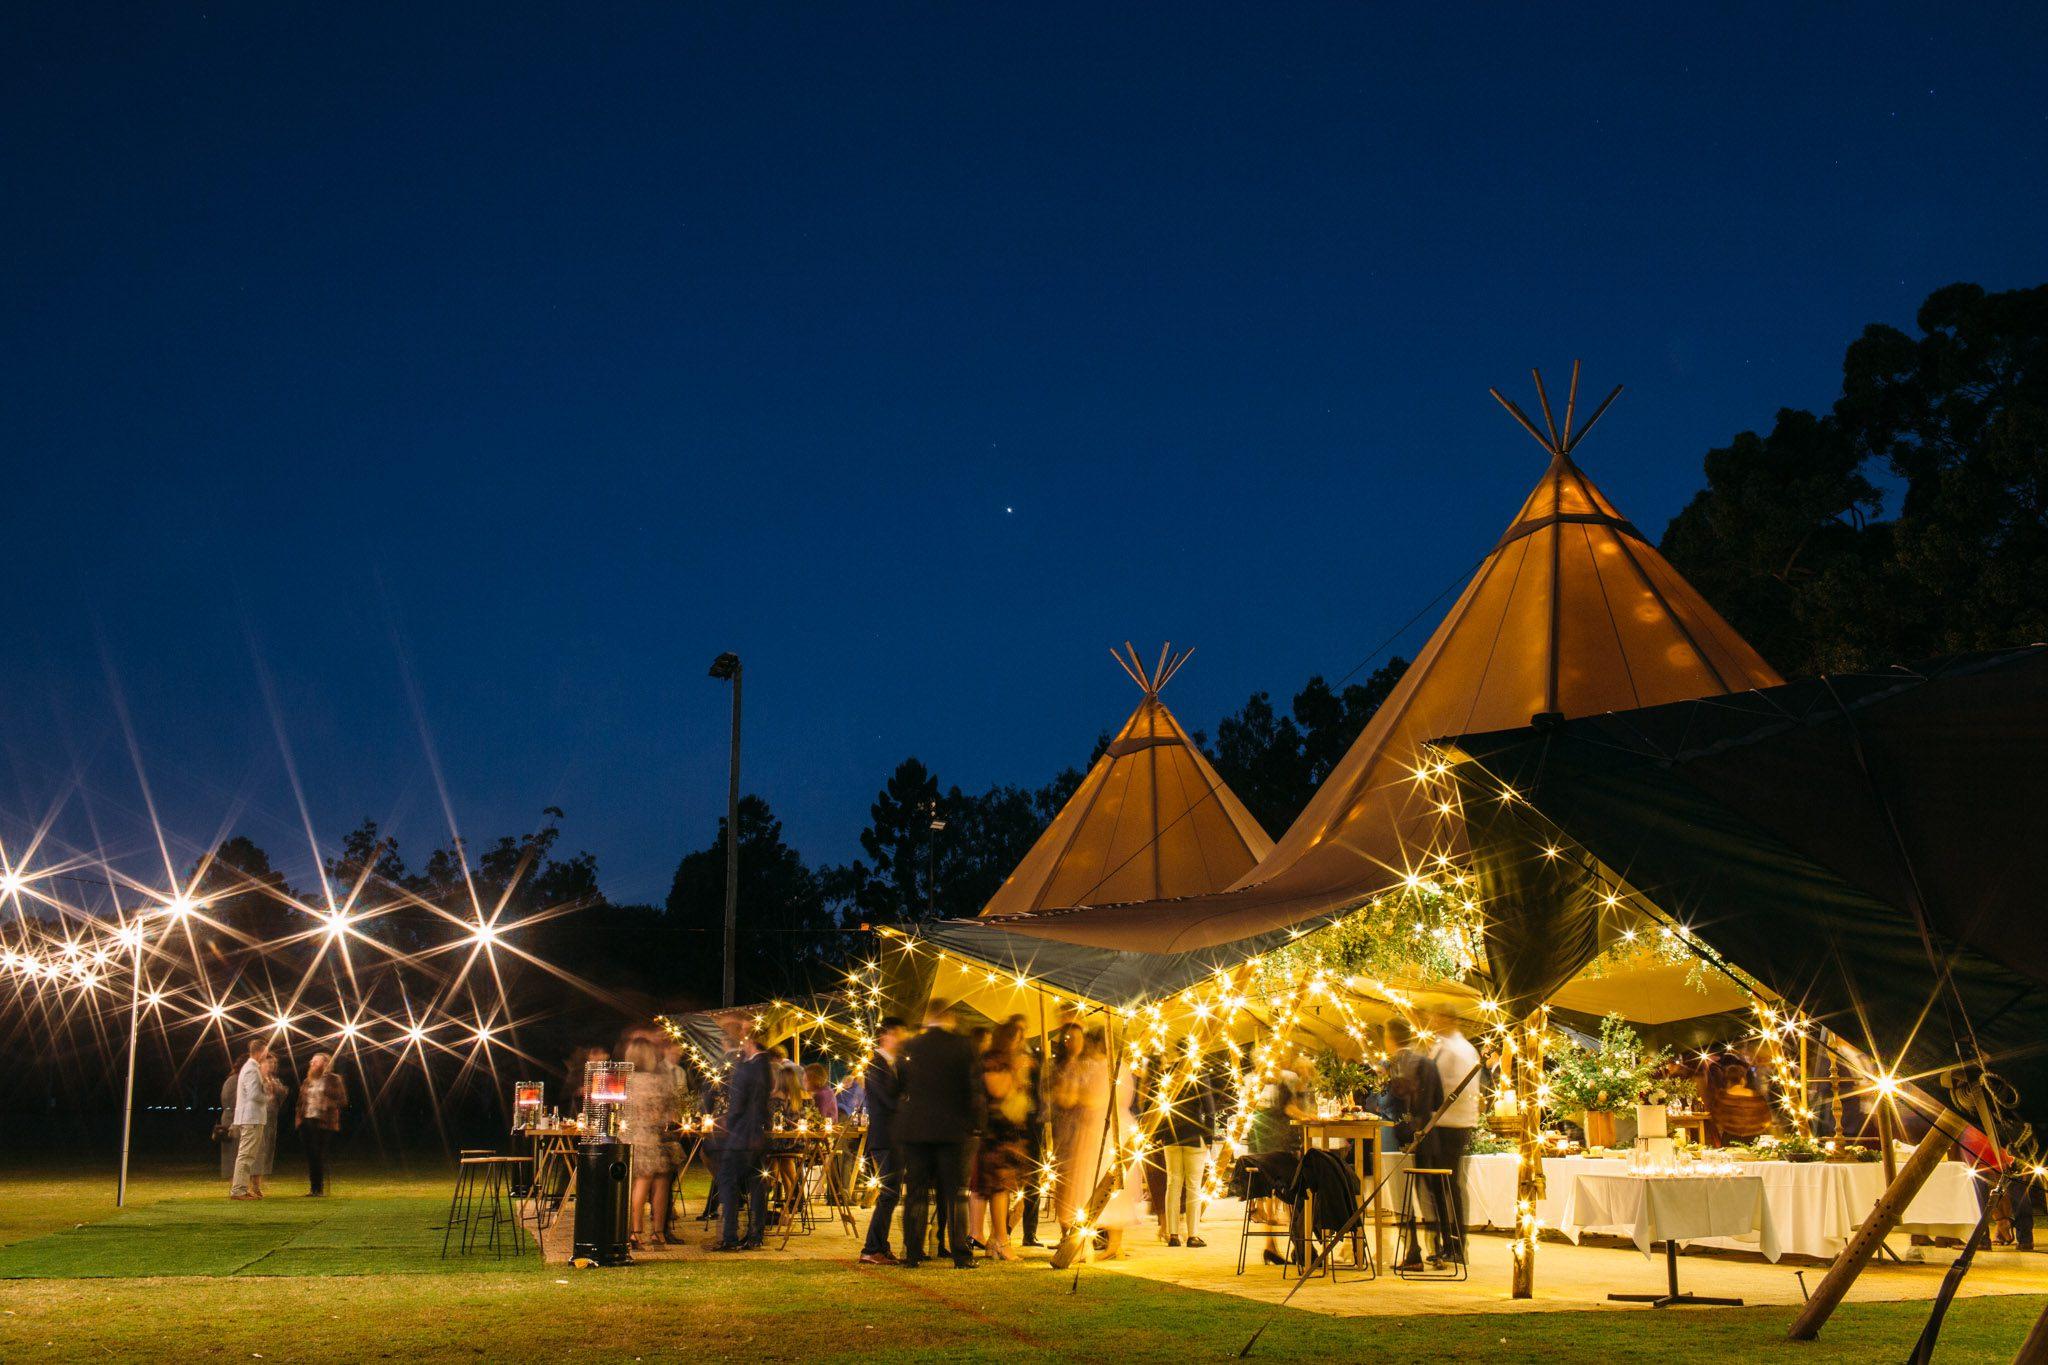 gold coast wedding, large tipi, large marquee hire, wedding venue, tipi, gold coast tipis